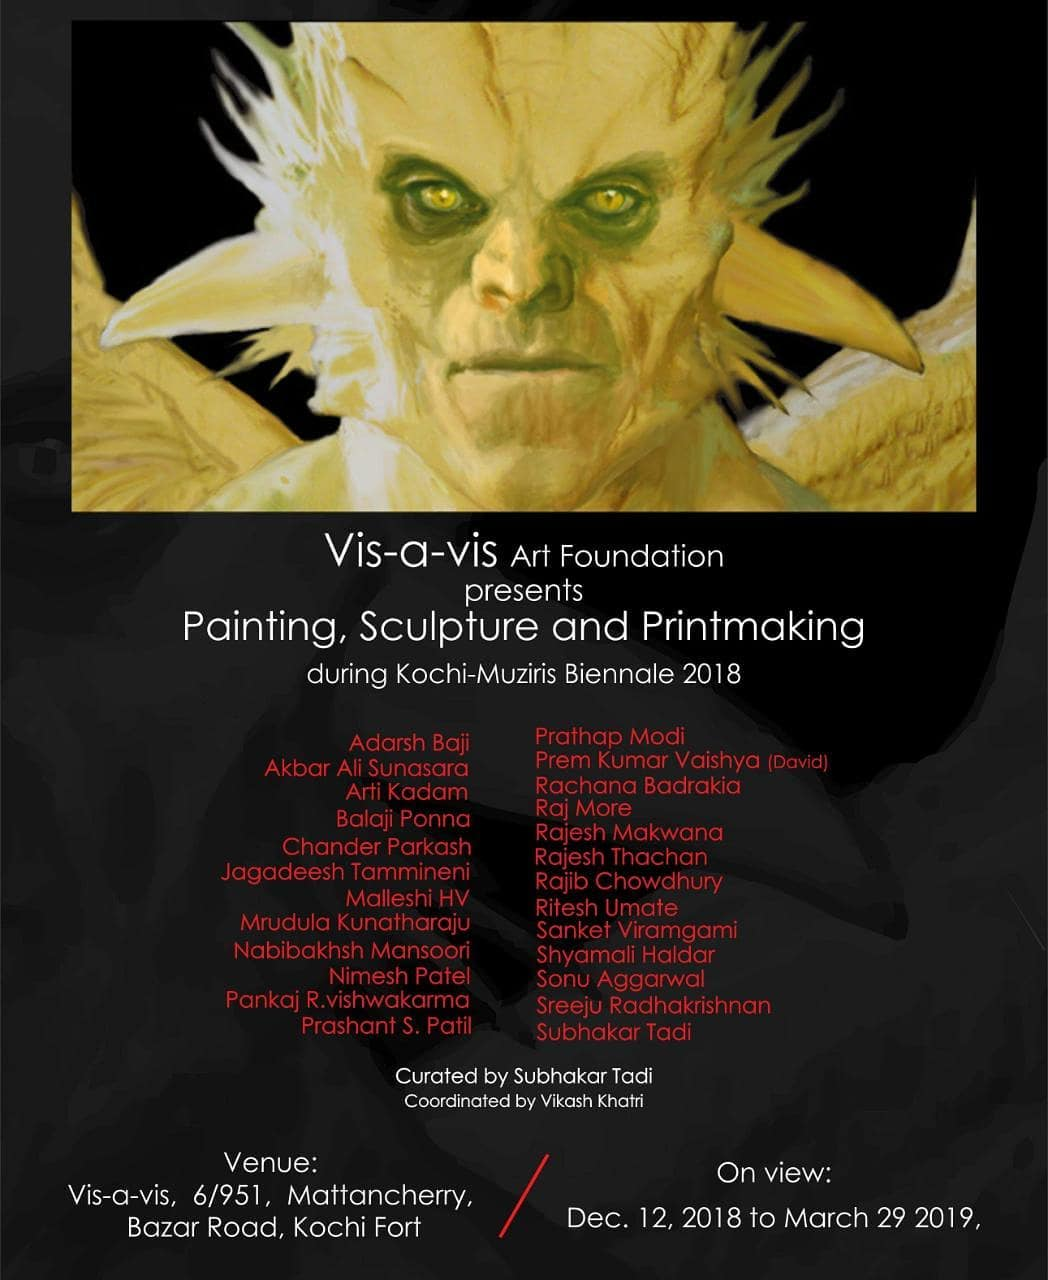 Vis-a-vis - Painting, Sculpture and Printmaking Exhibition, Kochi-Muziris Biennale